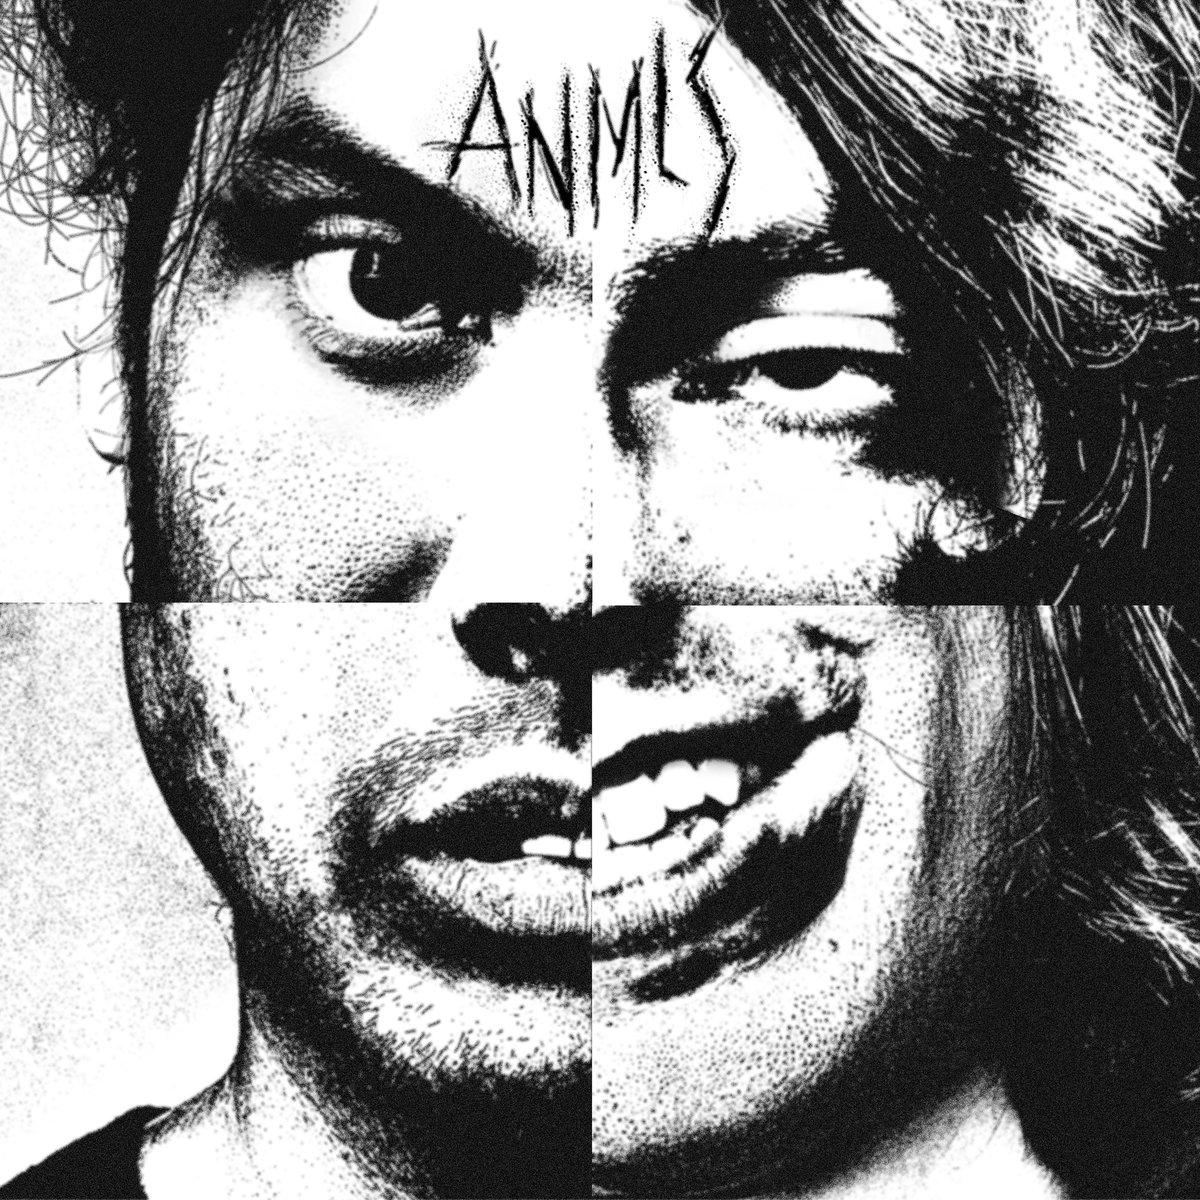 ANMLS – ANMLS (2018)